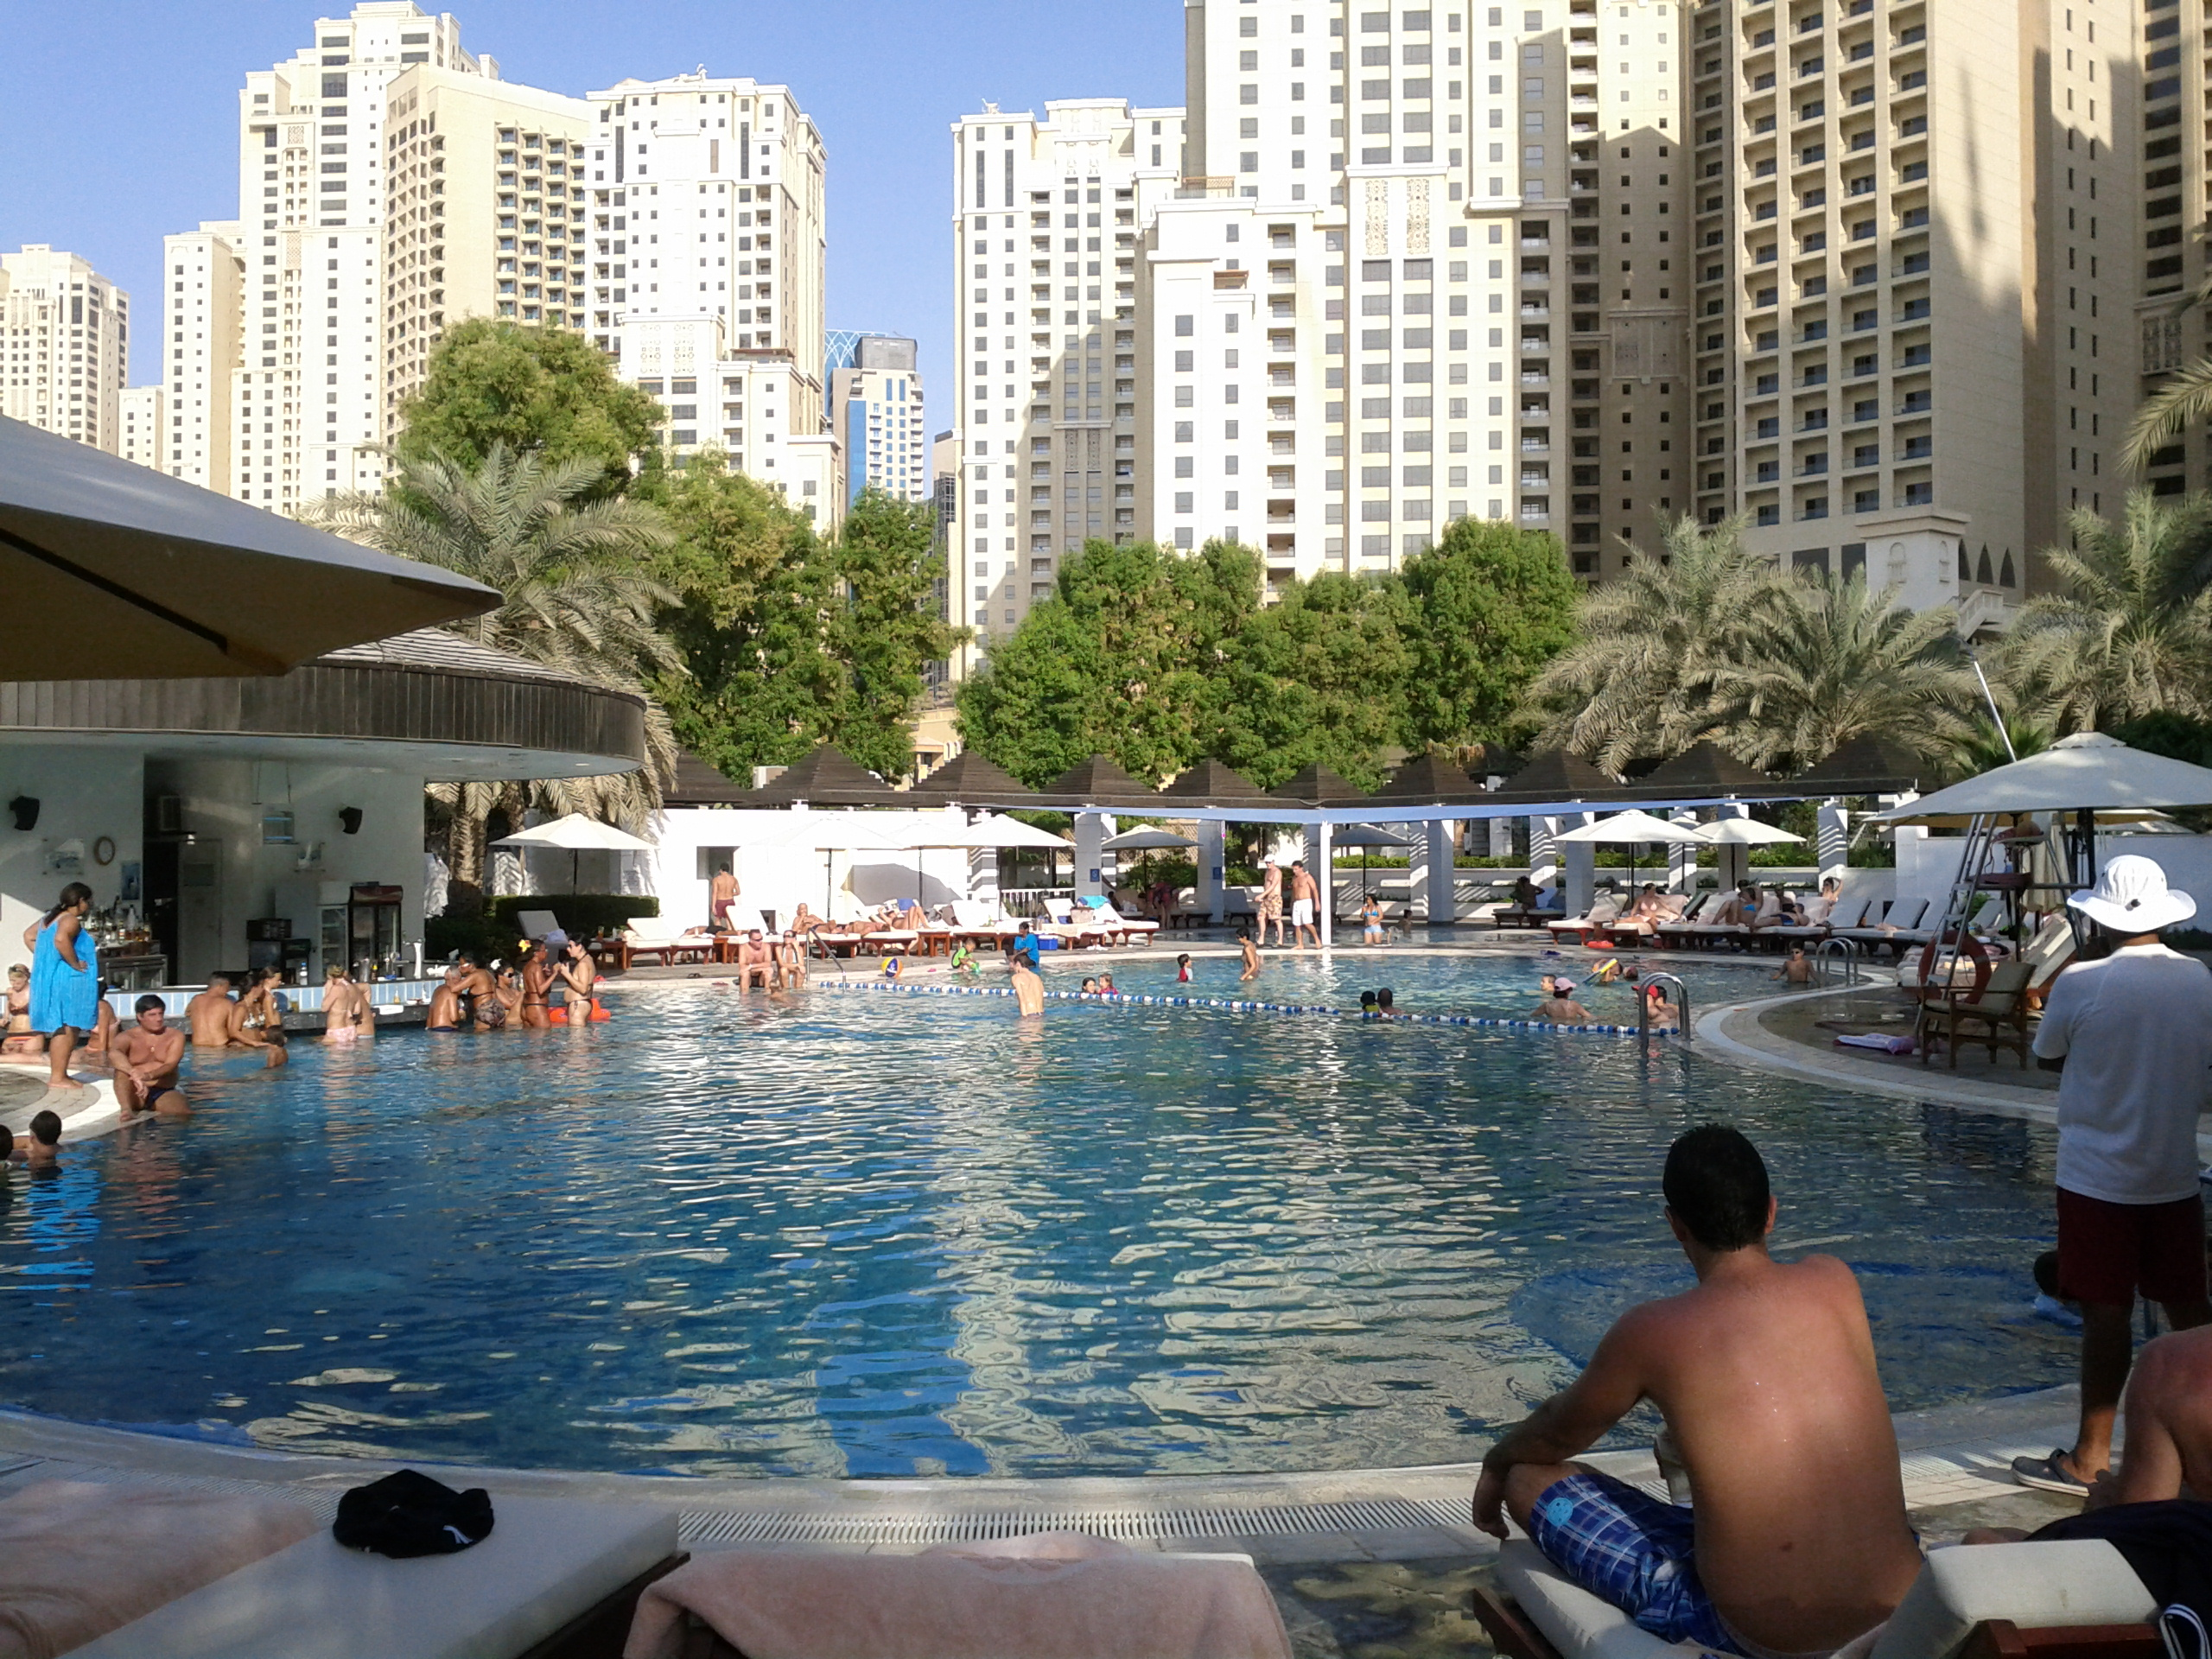 Sheraton Jumeirah Beach Resort & Towers, Dubai, Uae. Hotel Acadia. Aparthotel Rubimar. Siam Society Hotel. Fullon Hotels Jhongli. Timbers Hotel. Best Western Skei Hotel. Pine House Hotel. Hotel Rex